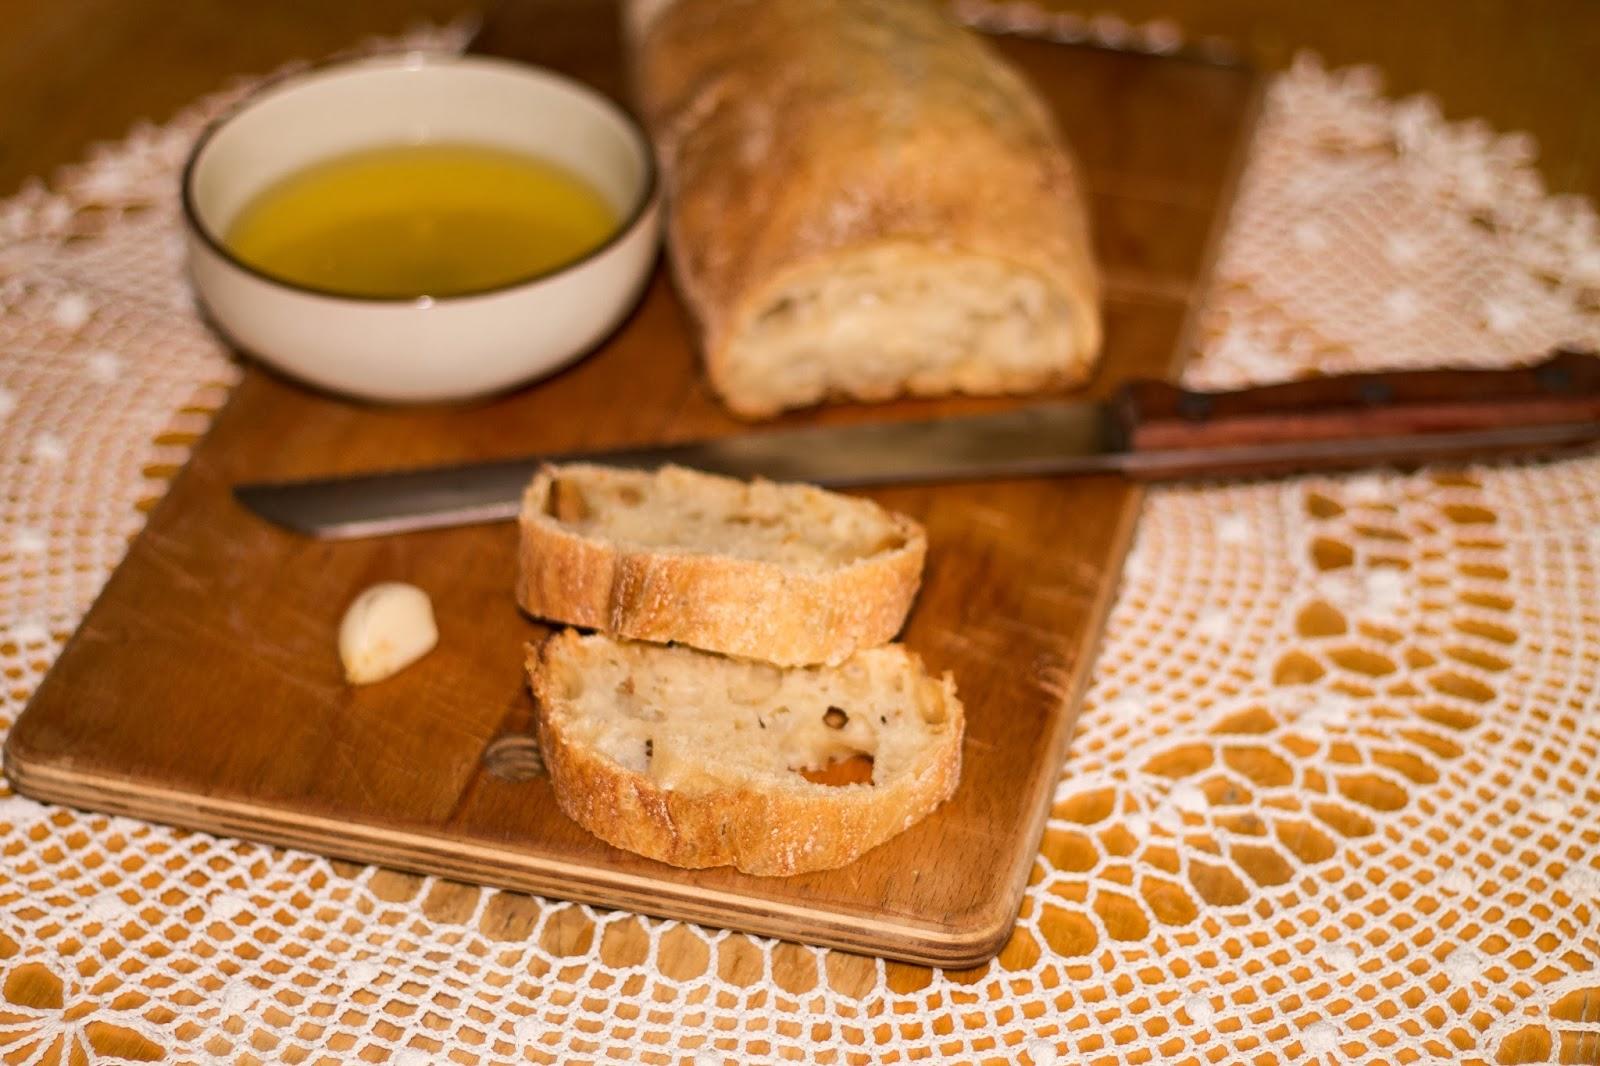 салфетка крючком, хлеб, домашний хлеб, хлеб с большими дырками